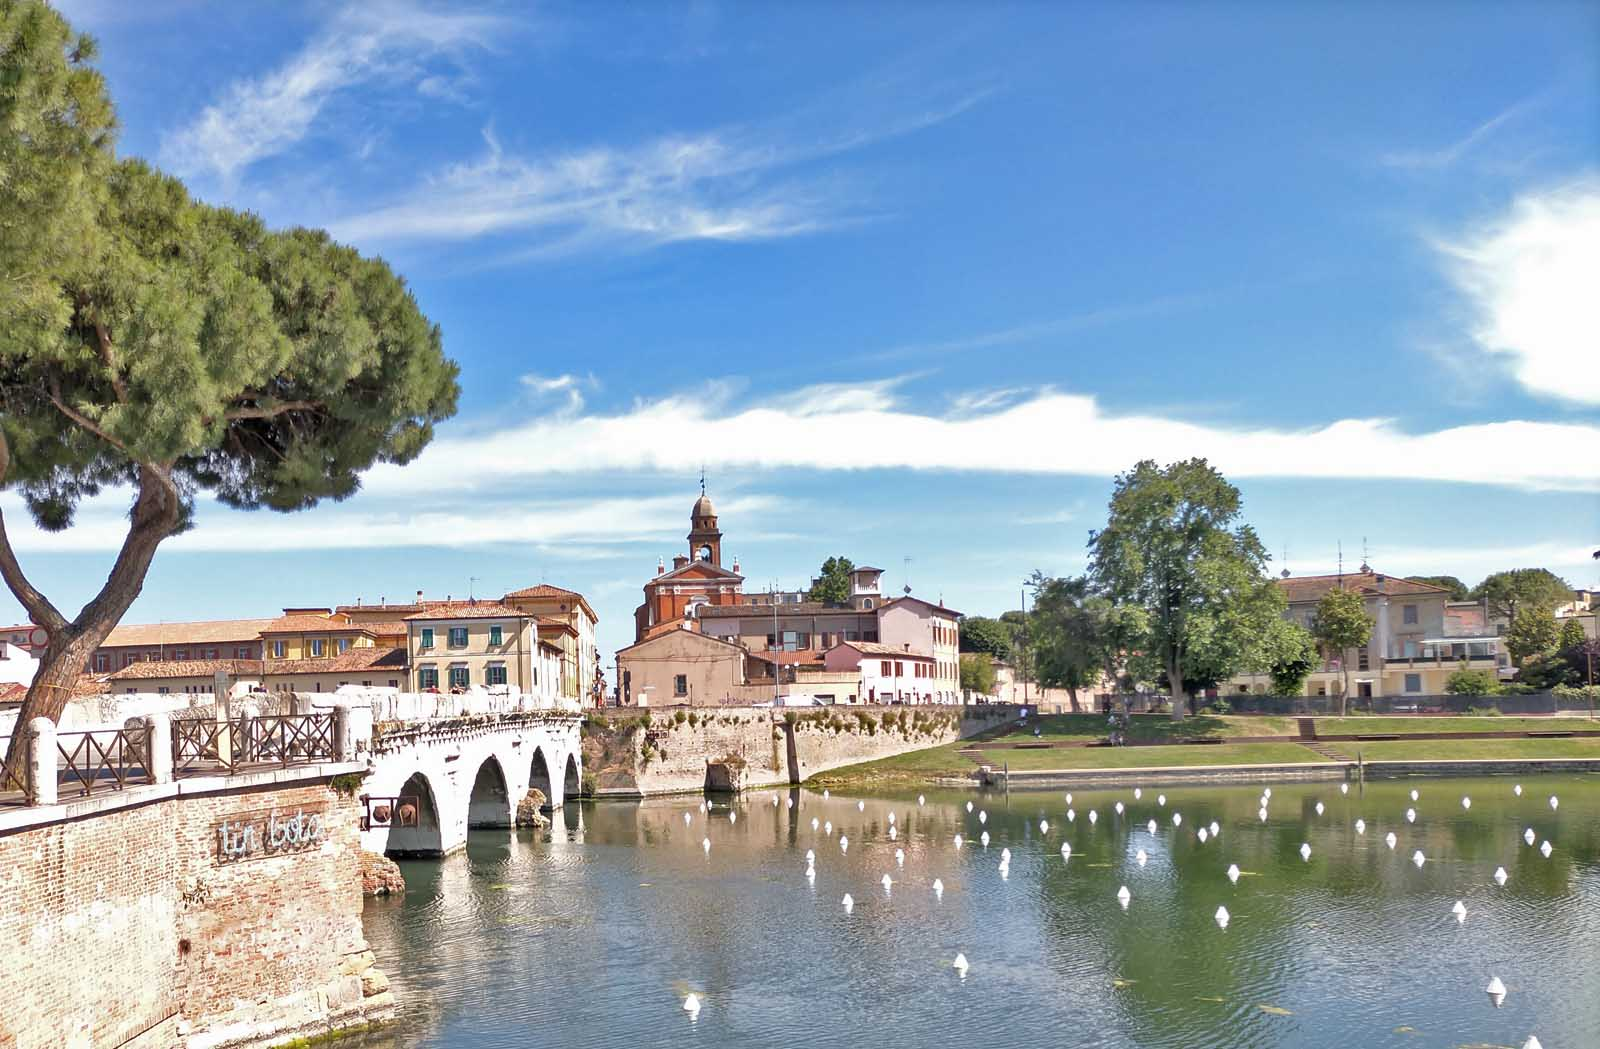 Dieses Bild hat ein leeres Alt-Attribut. Der Dateiname ist 056-Italien-2021-Rimini-ponte-di-tiberio.jpg